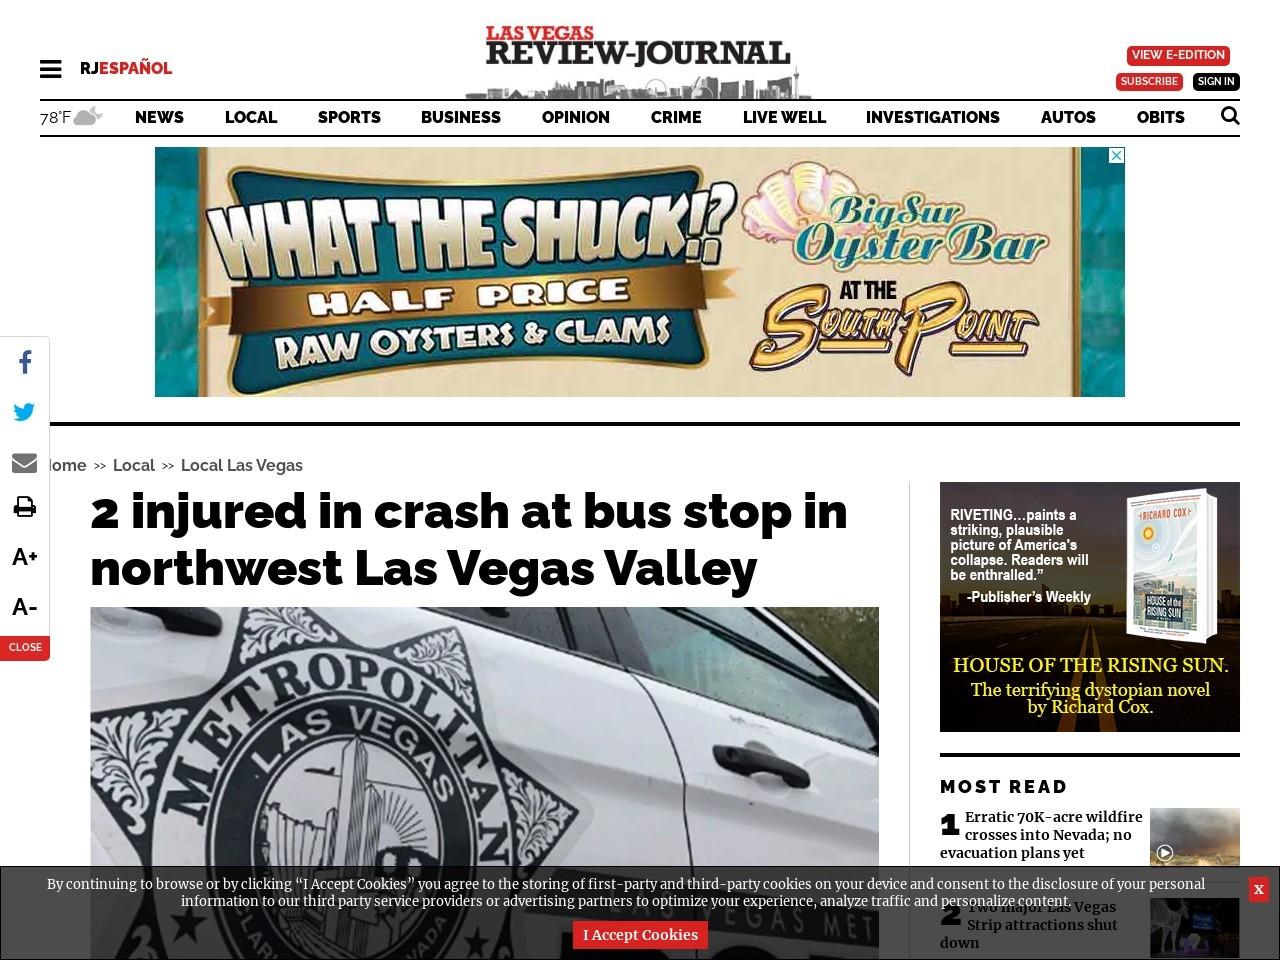 2 injured in crash at bus stop in northwest Las Vegas Valley